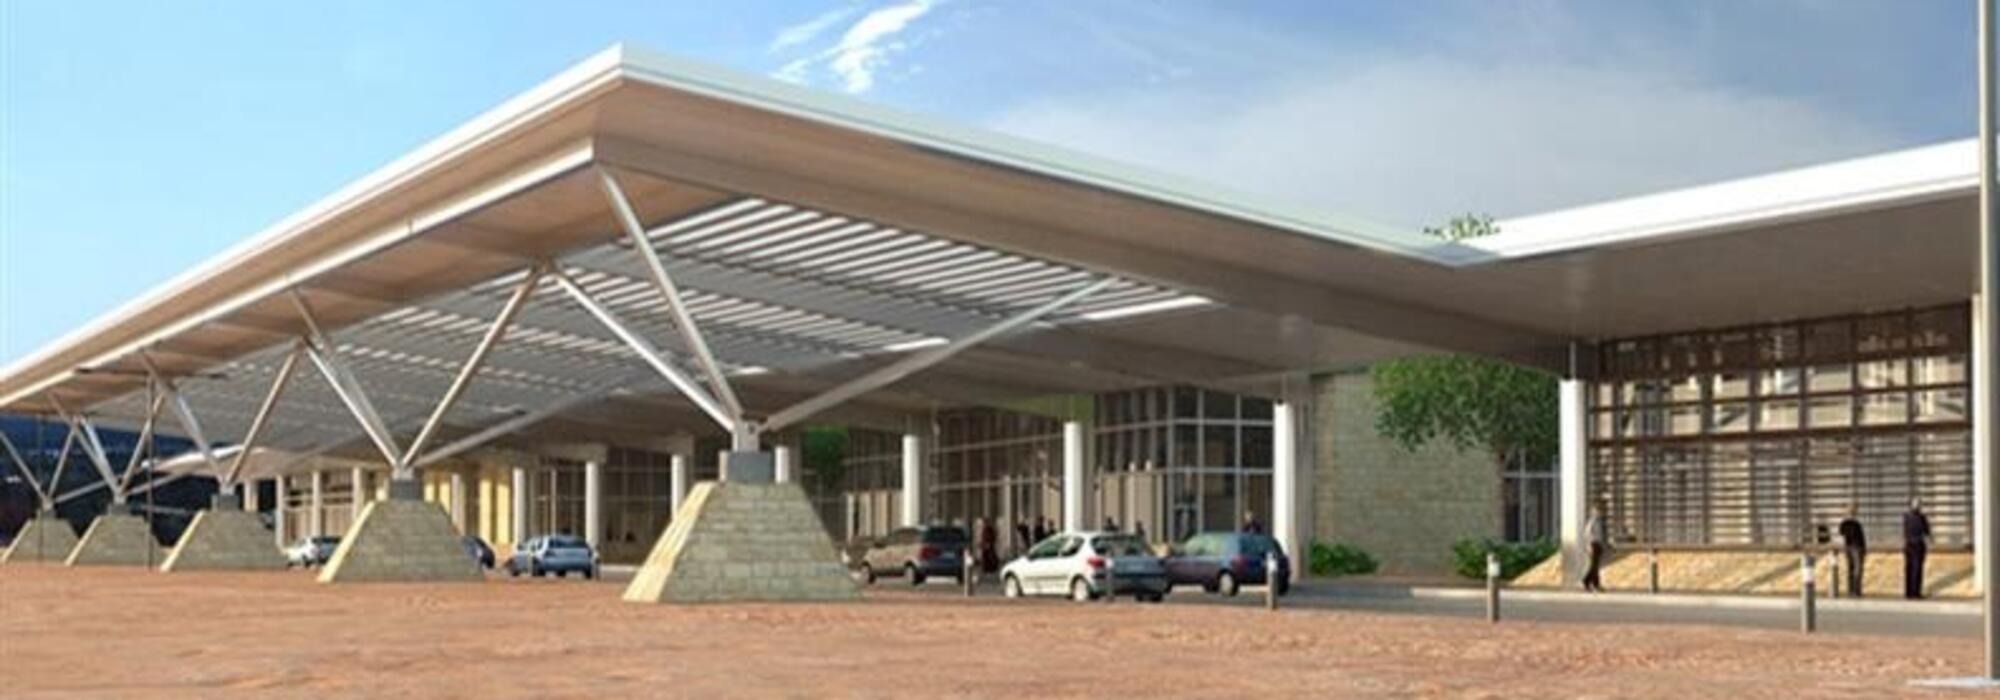 Aeropuerto de Seymour